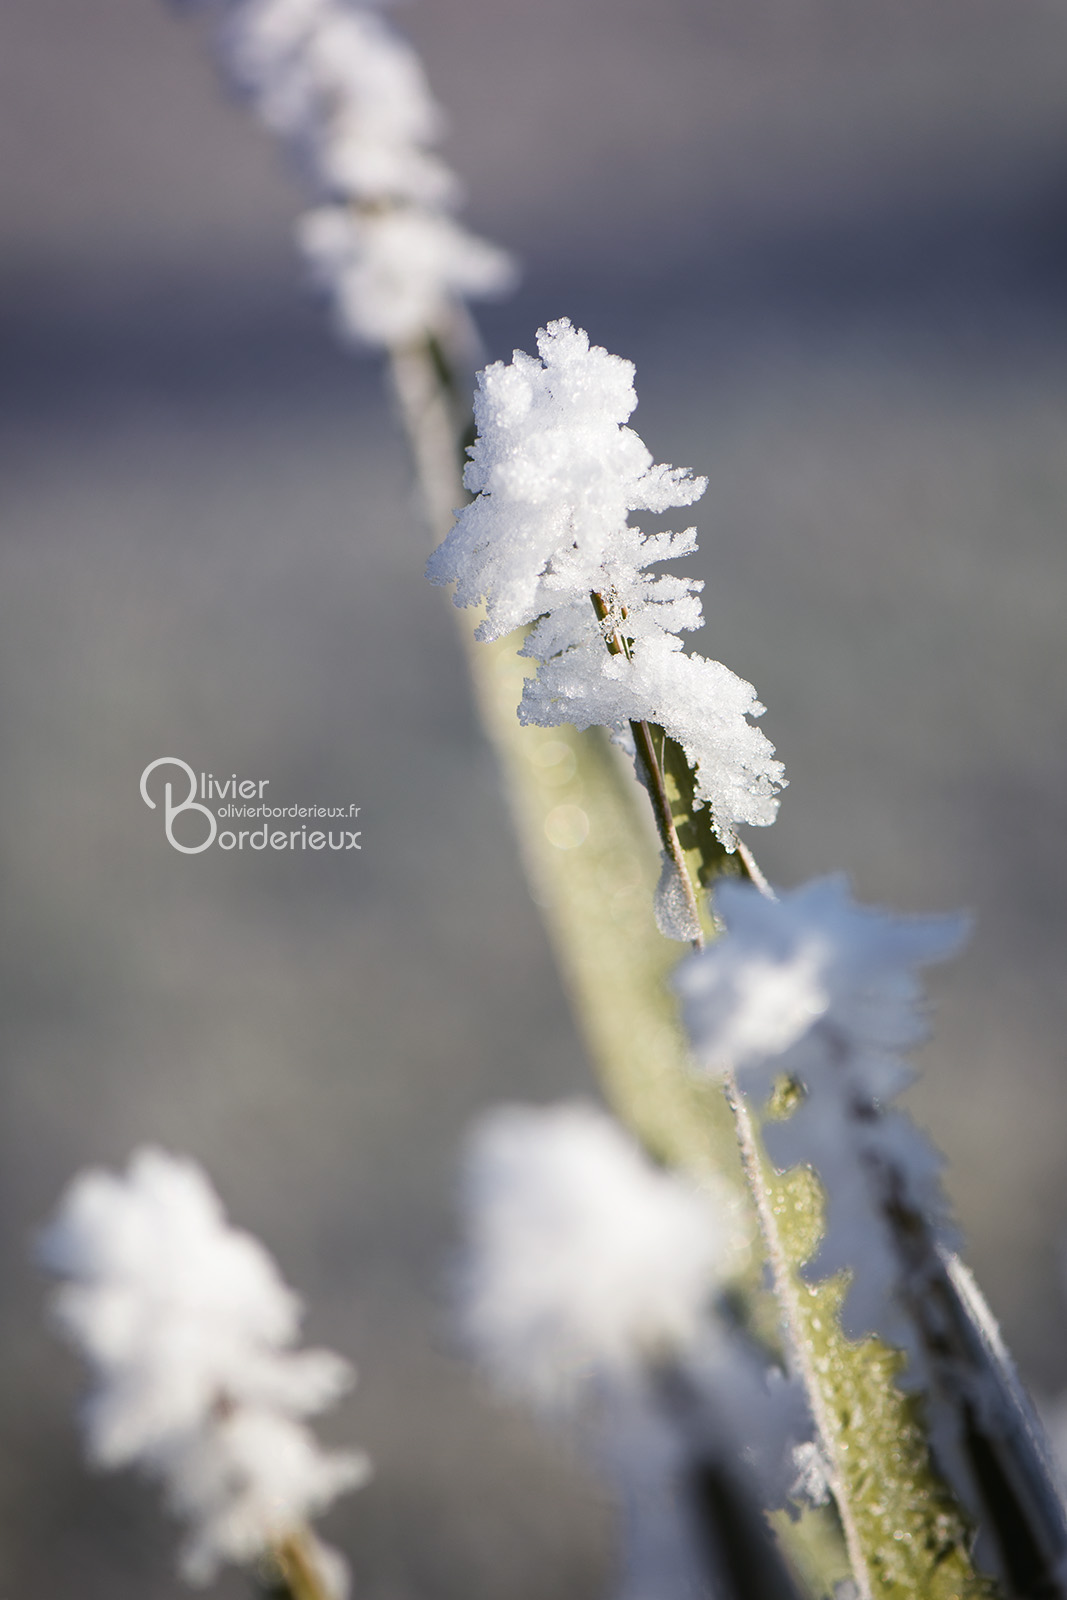 Arrivée de l'hiver